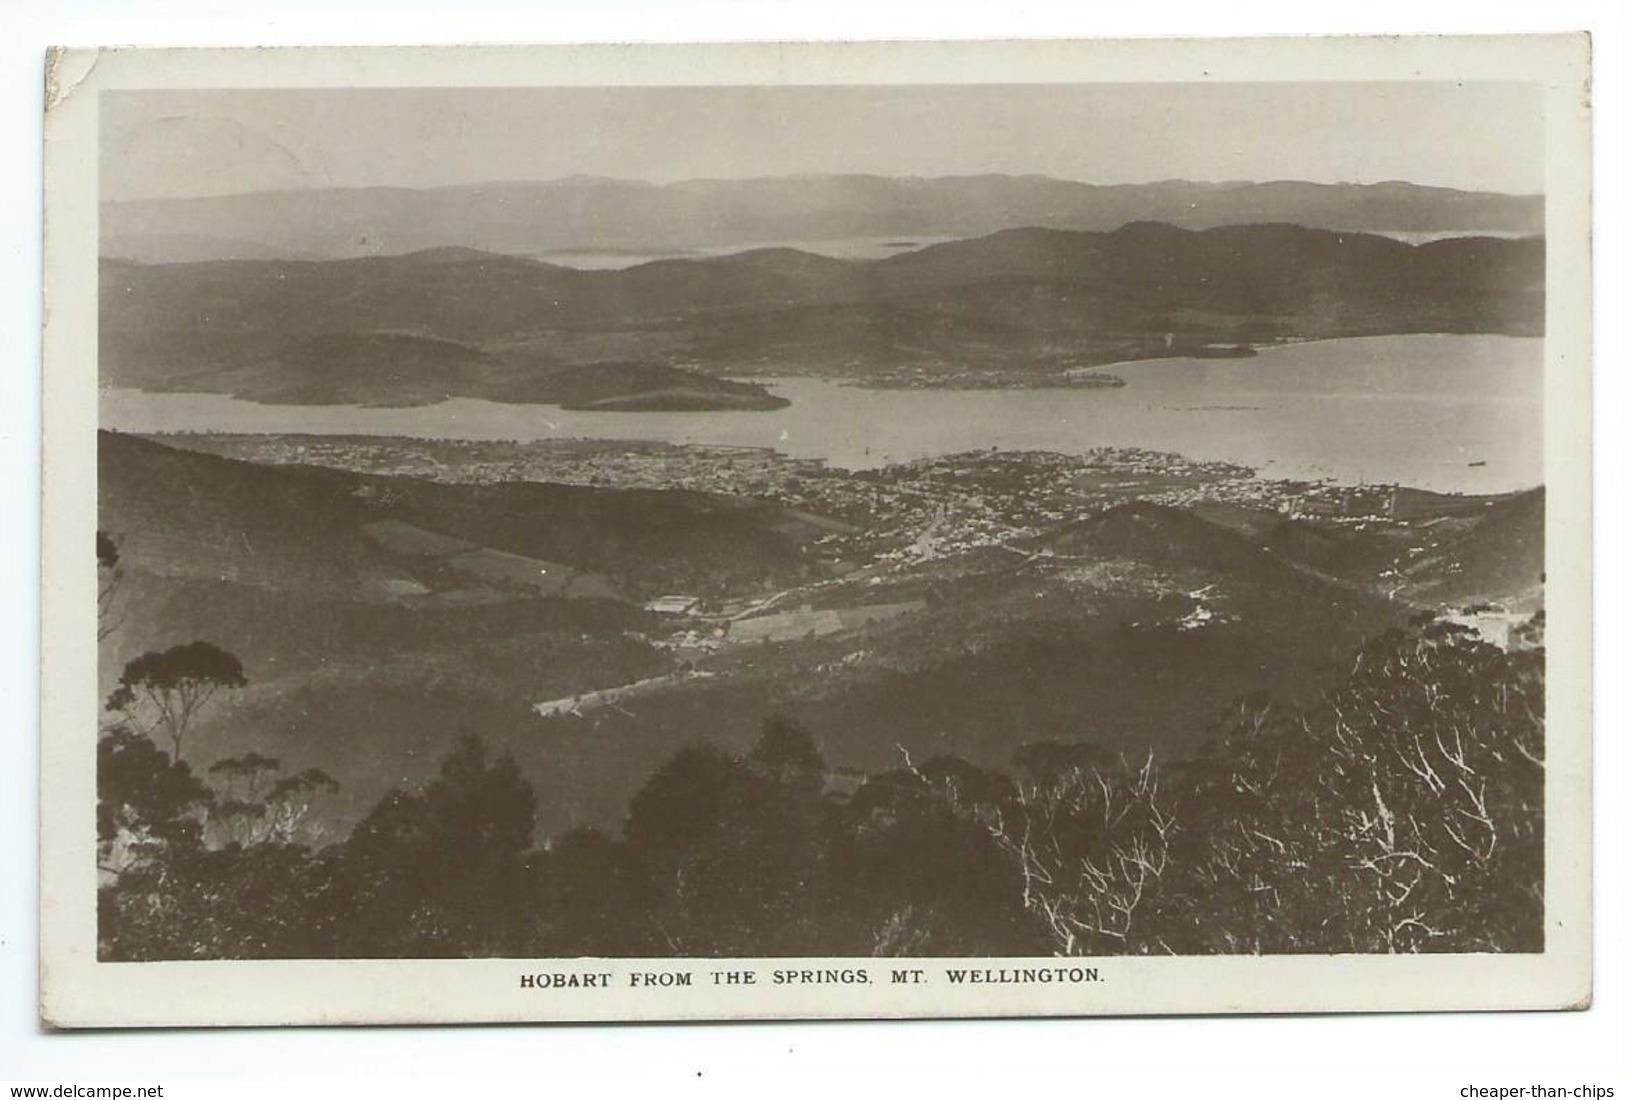 Hobart From The Springs. Mt. Wellington - Hobart